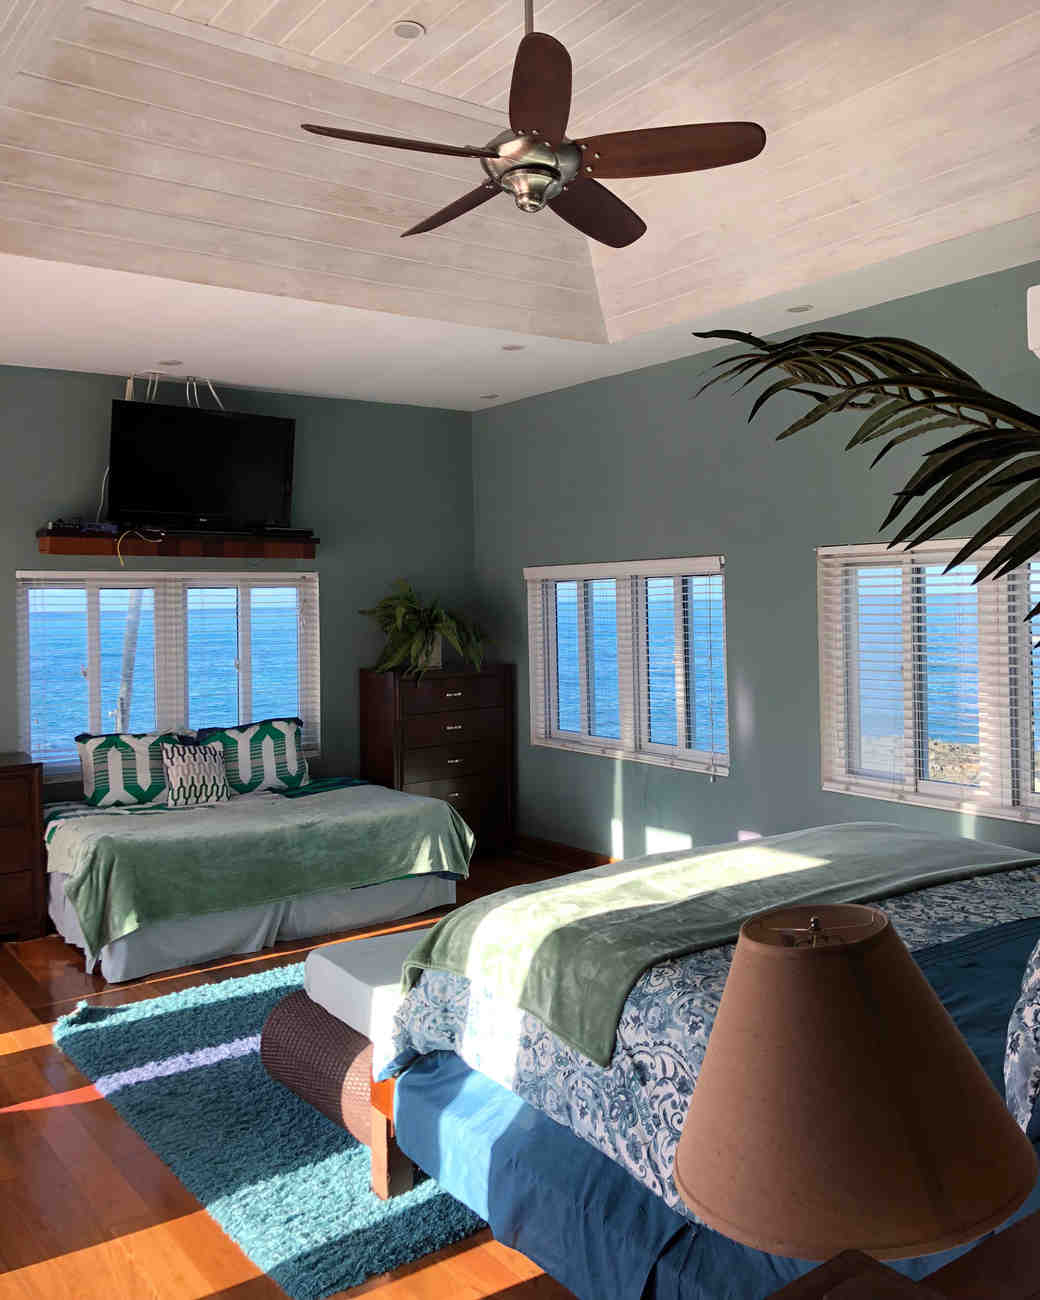 air bnb wedding venue green bedroom overlooking the ocean